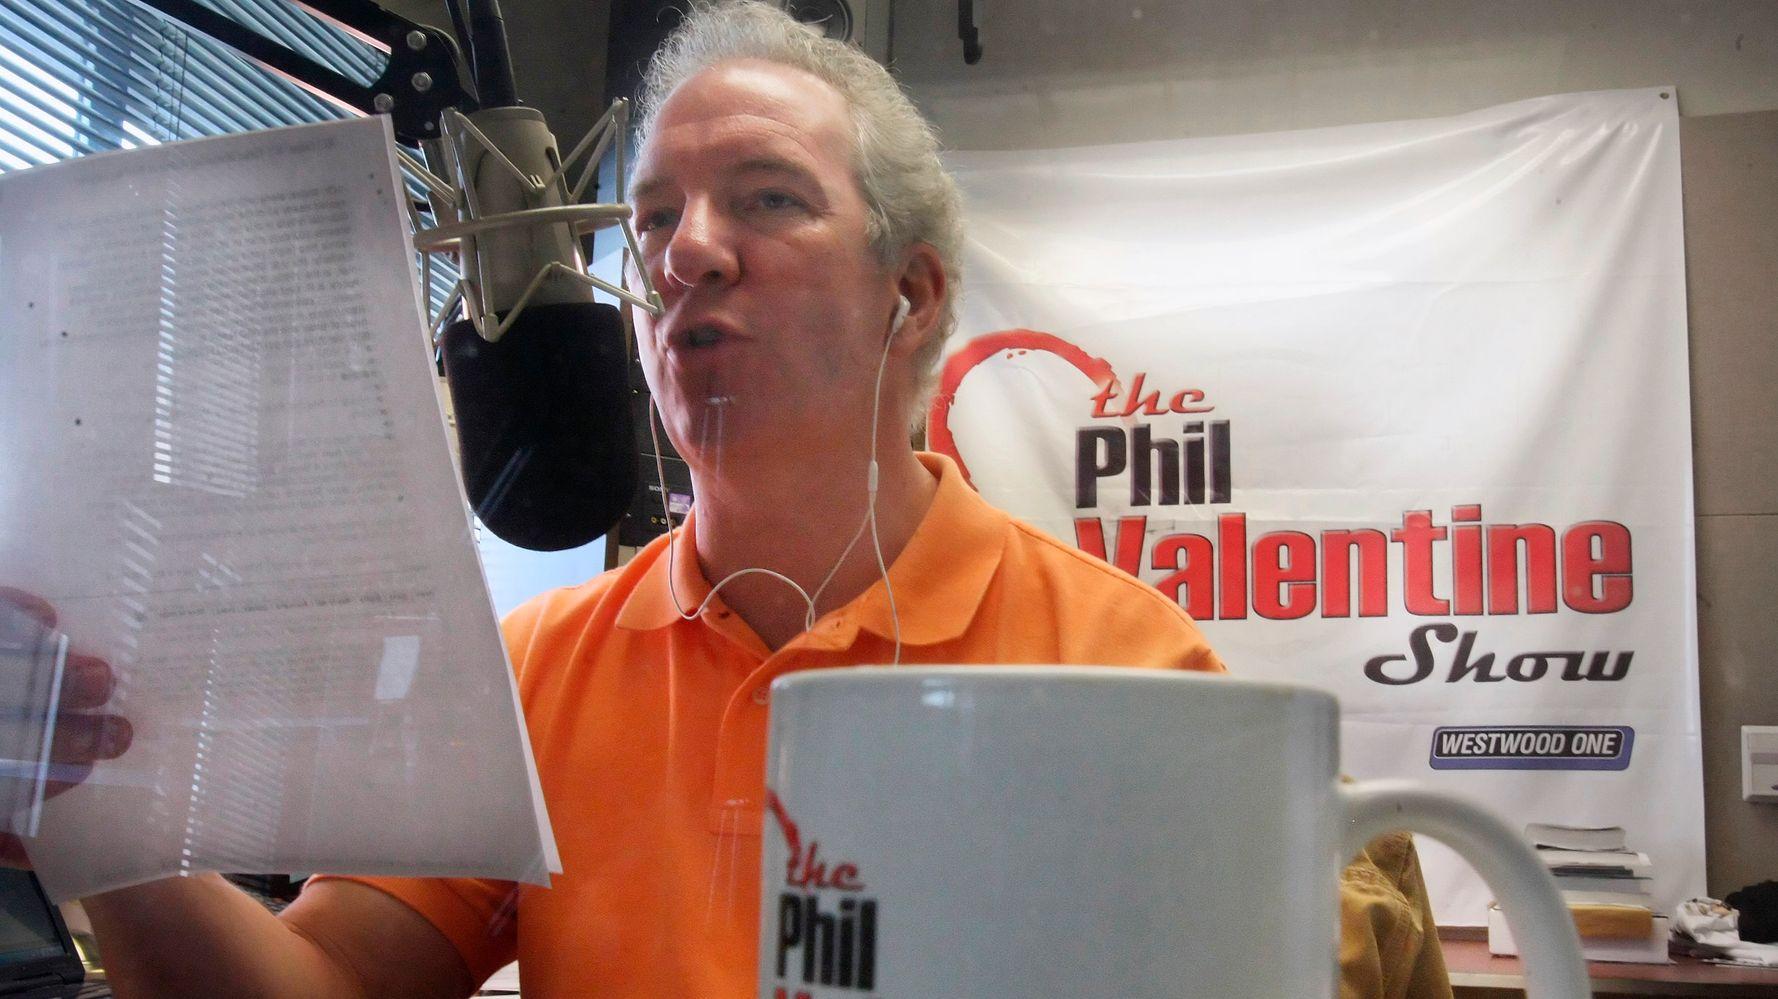 Conservative Radio Host Phil Valentine Dies After COVID-19 Illness